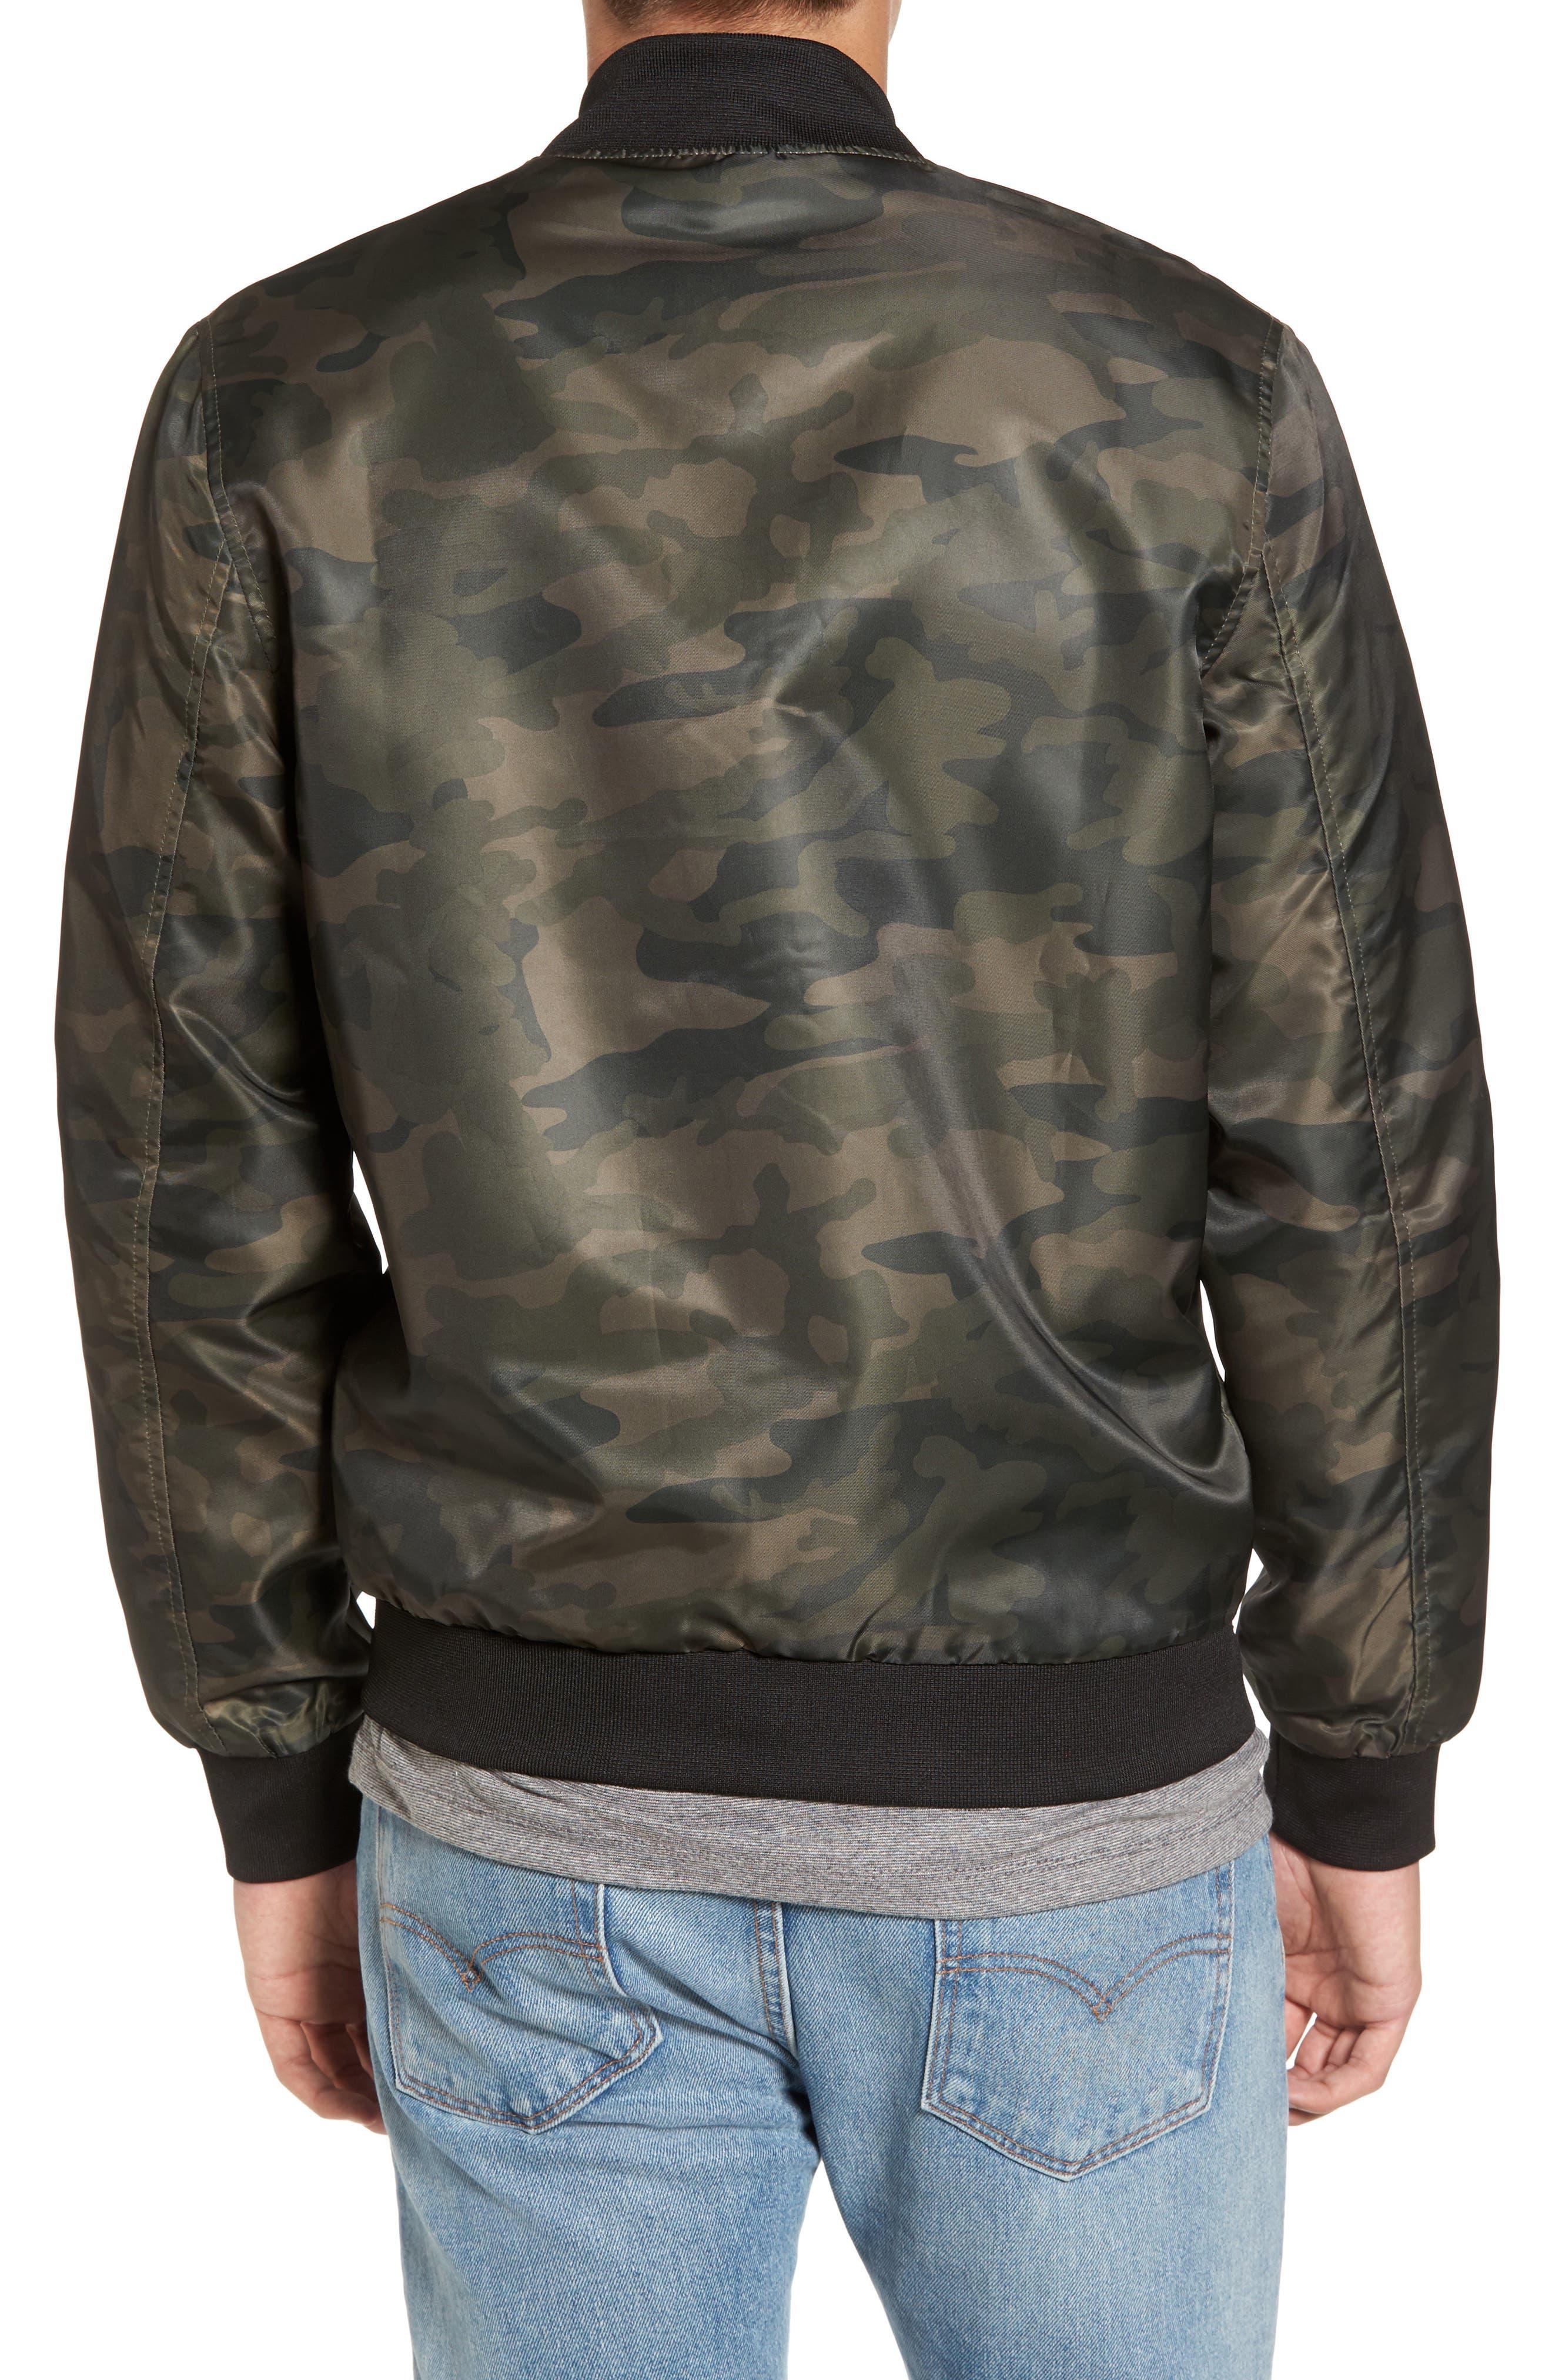 Nylon Bomber Jacket,                             Alternate thumbnail 2, color,                             Olive Dark Camouflage